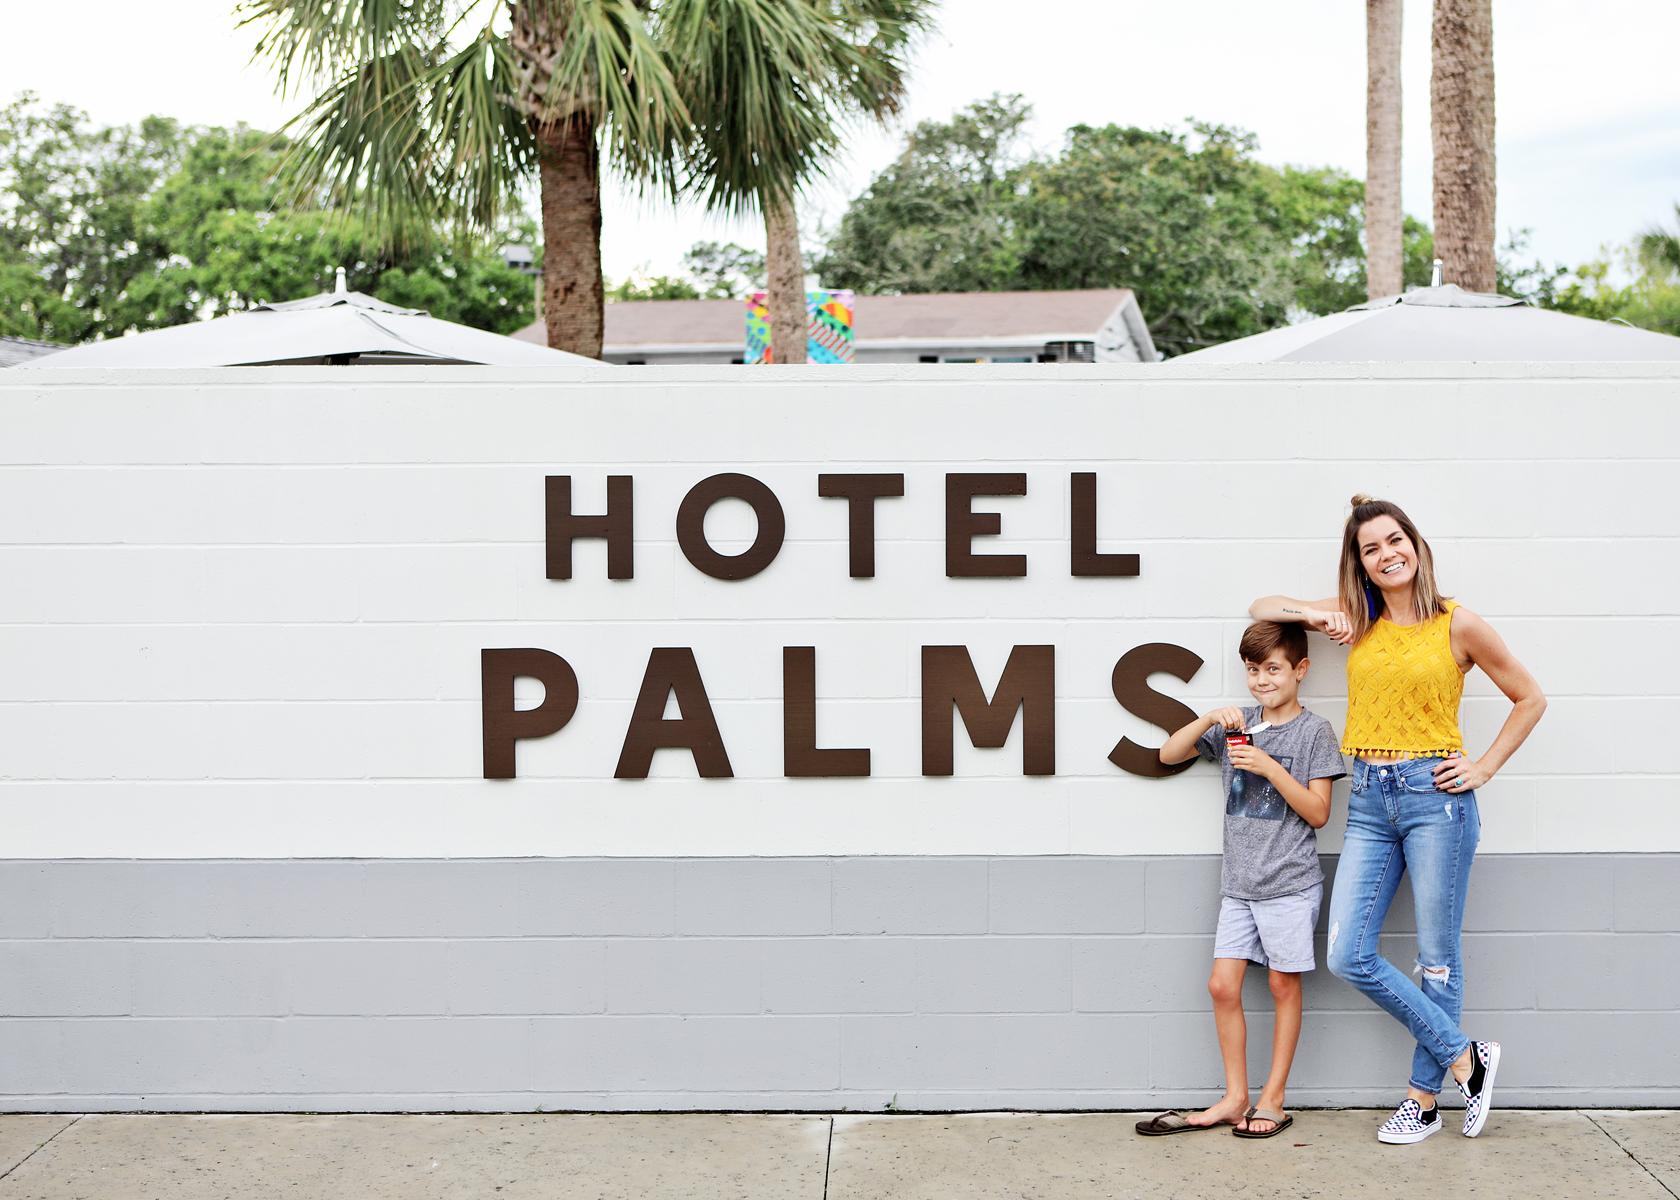 Atlantic Beach - Hotel Palms